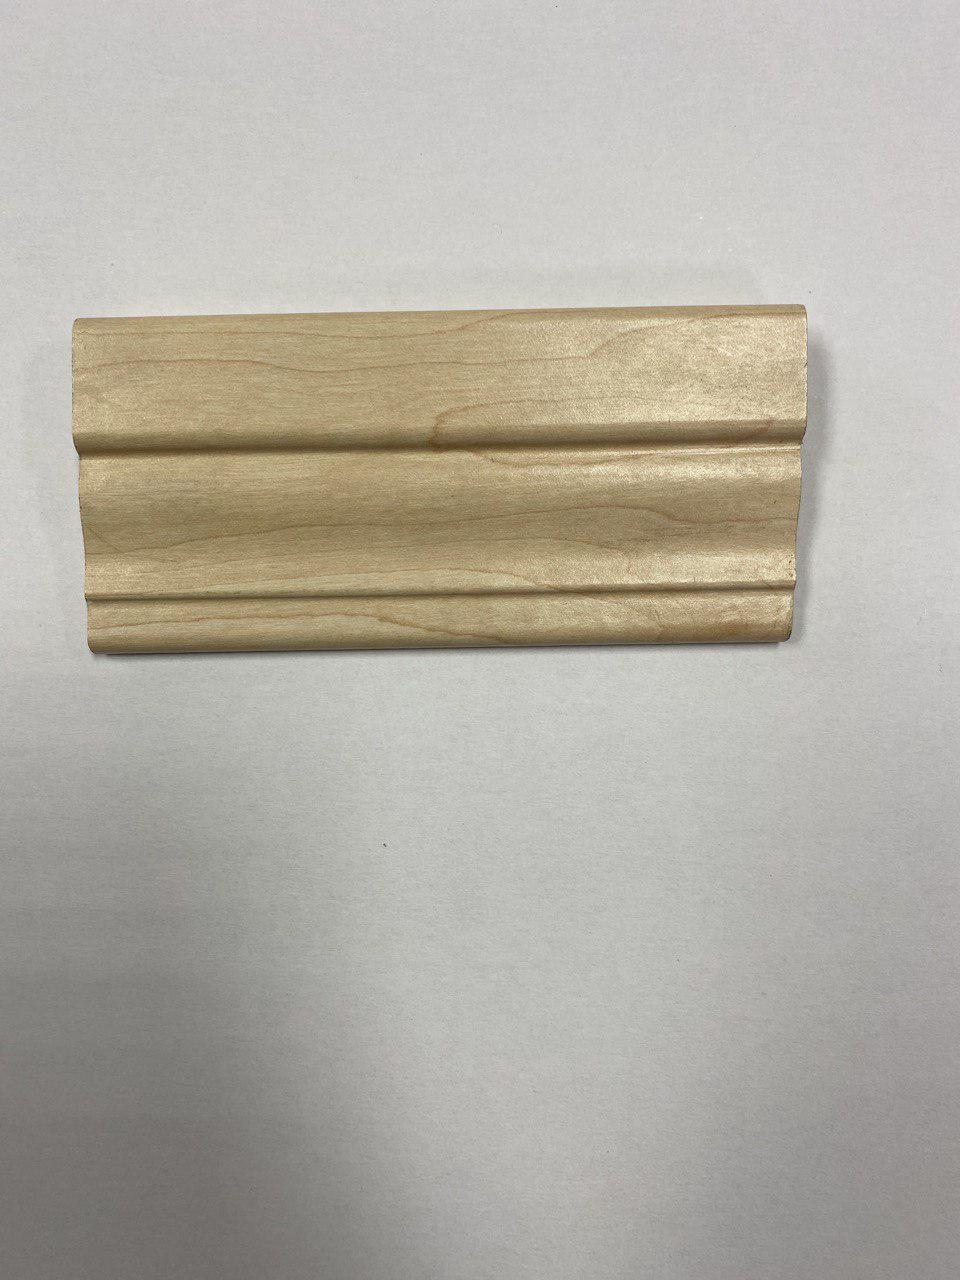 Накладка МДФ OMR-002-000 11.7*60 мм